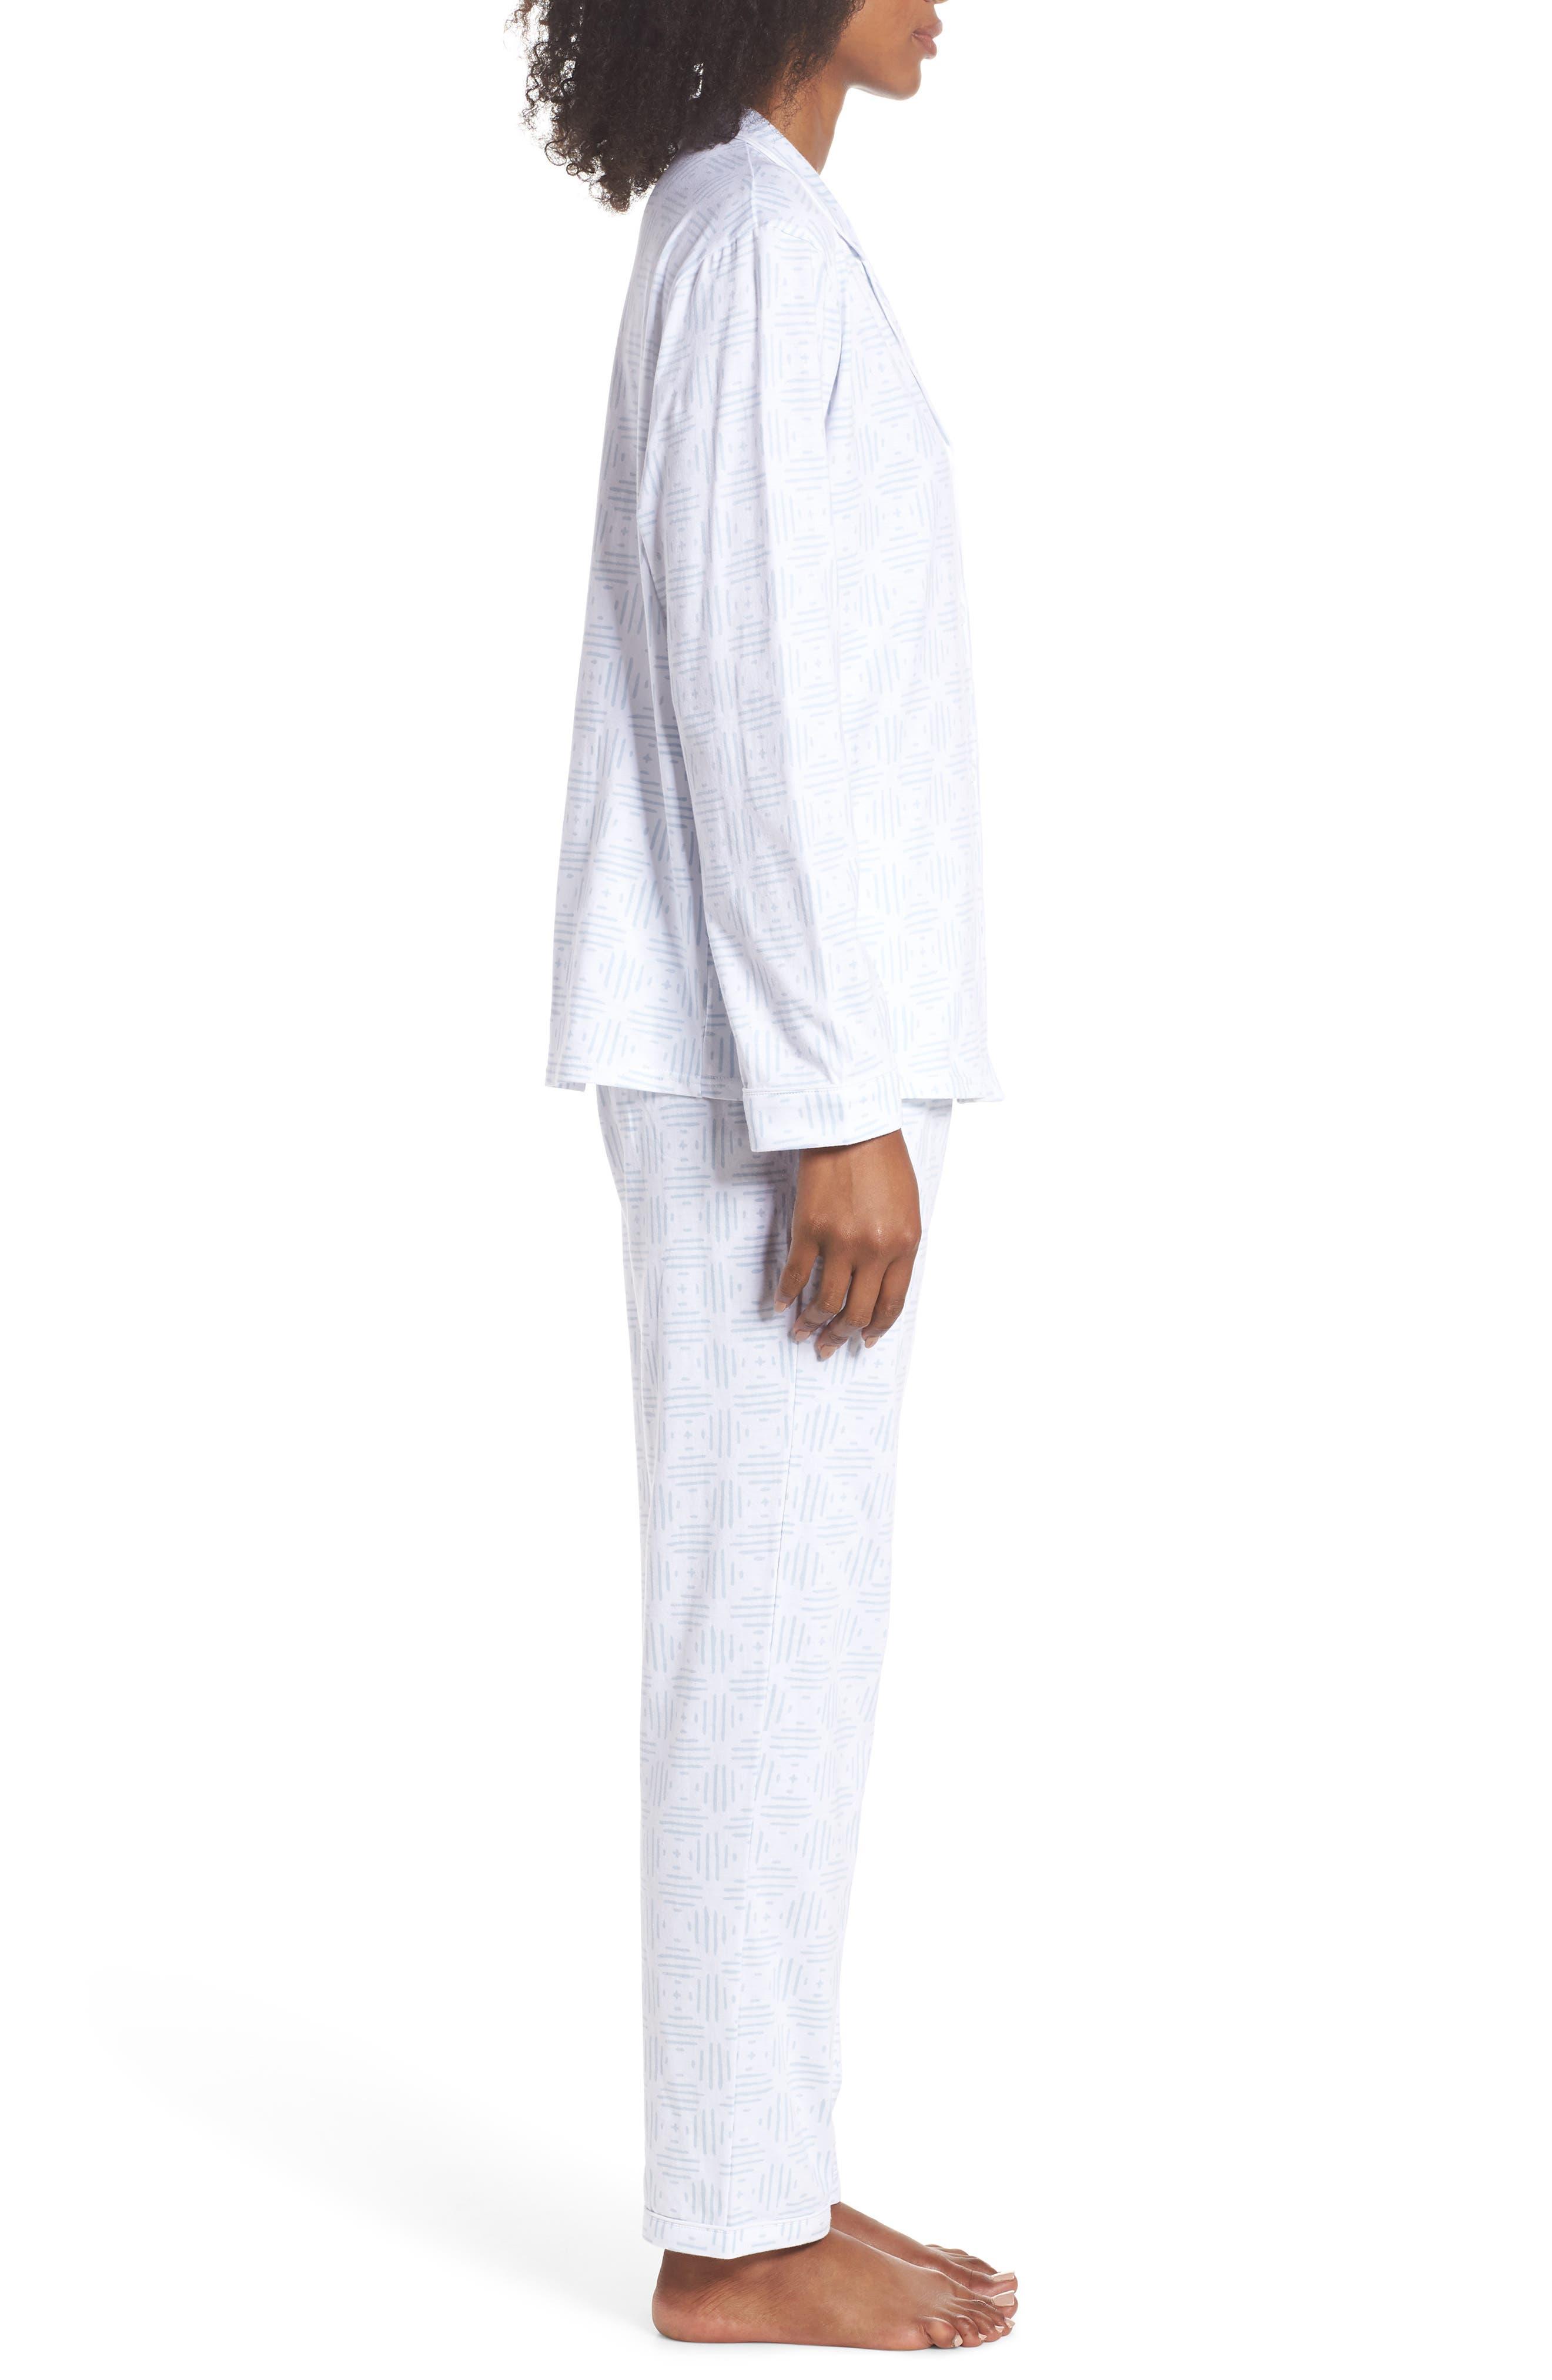 Moroccan Tile Pajamas,                             Alternate thumbnail 3, color,                             Moro Tile Blue